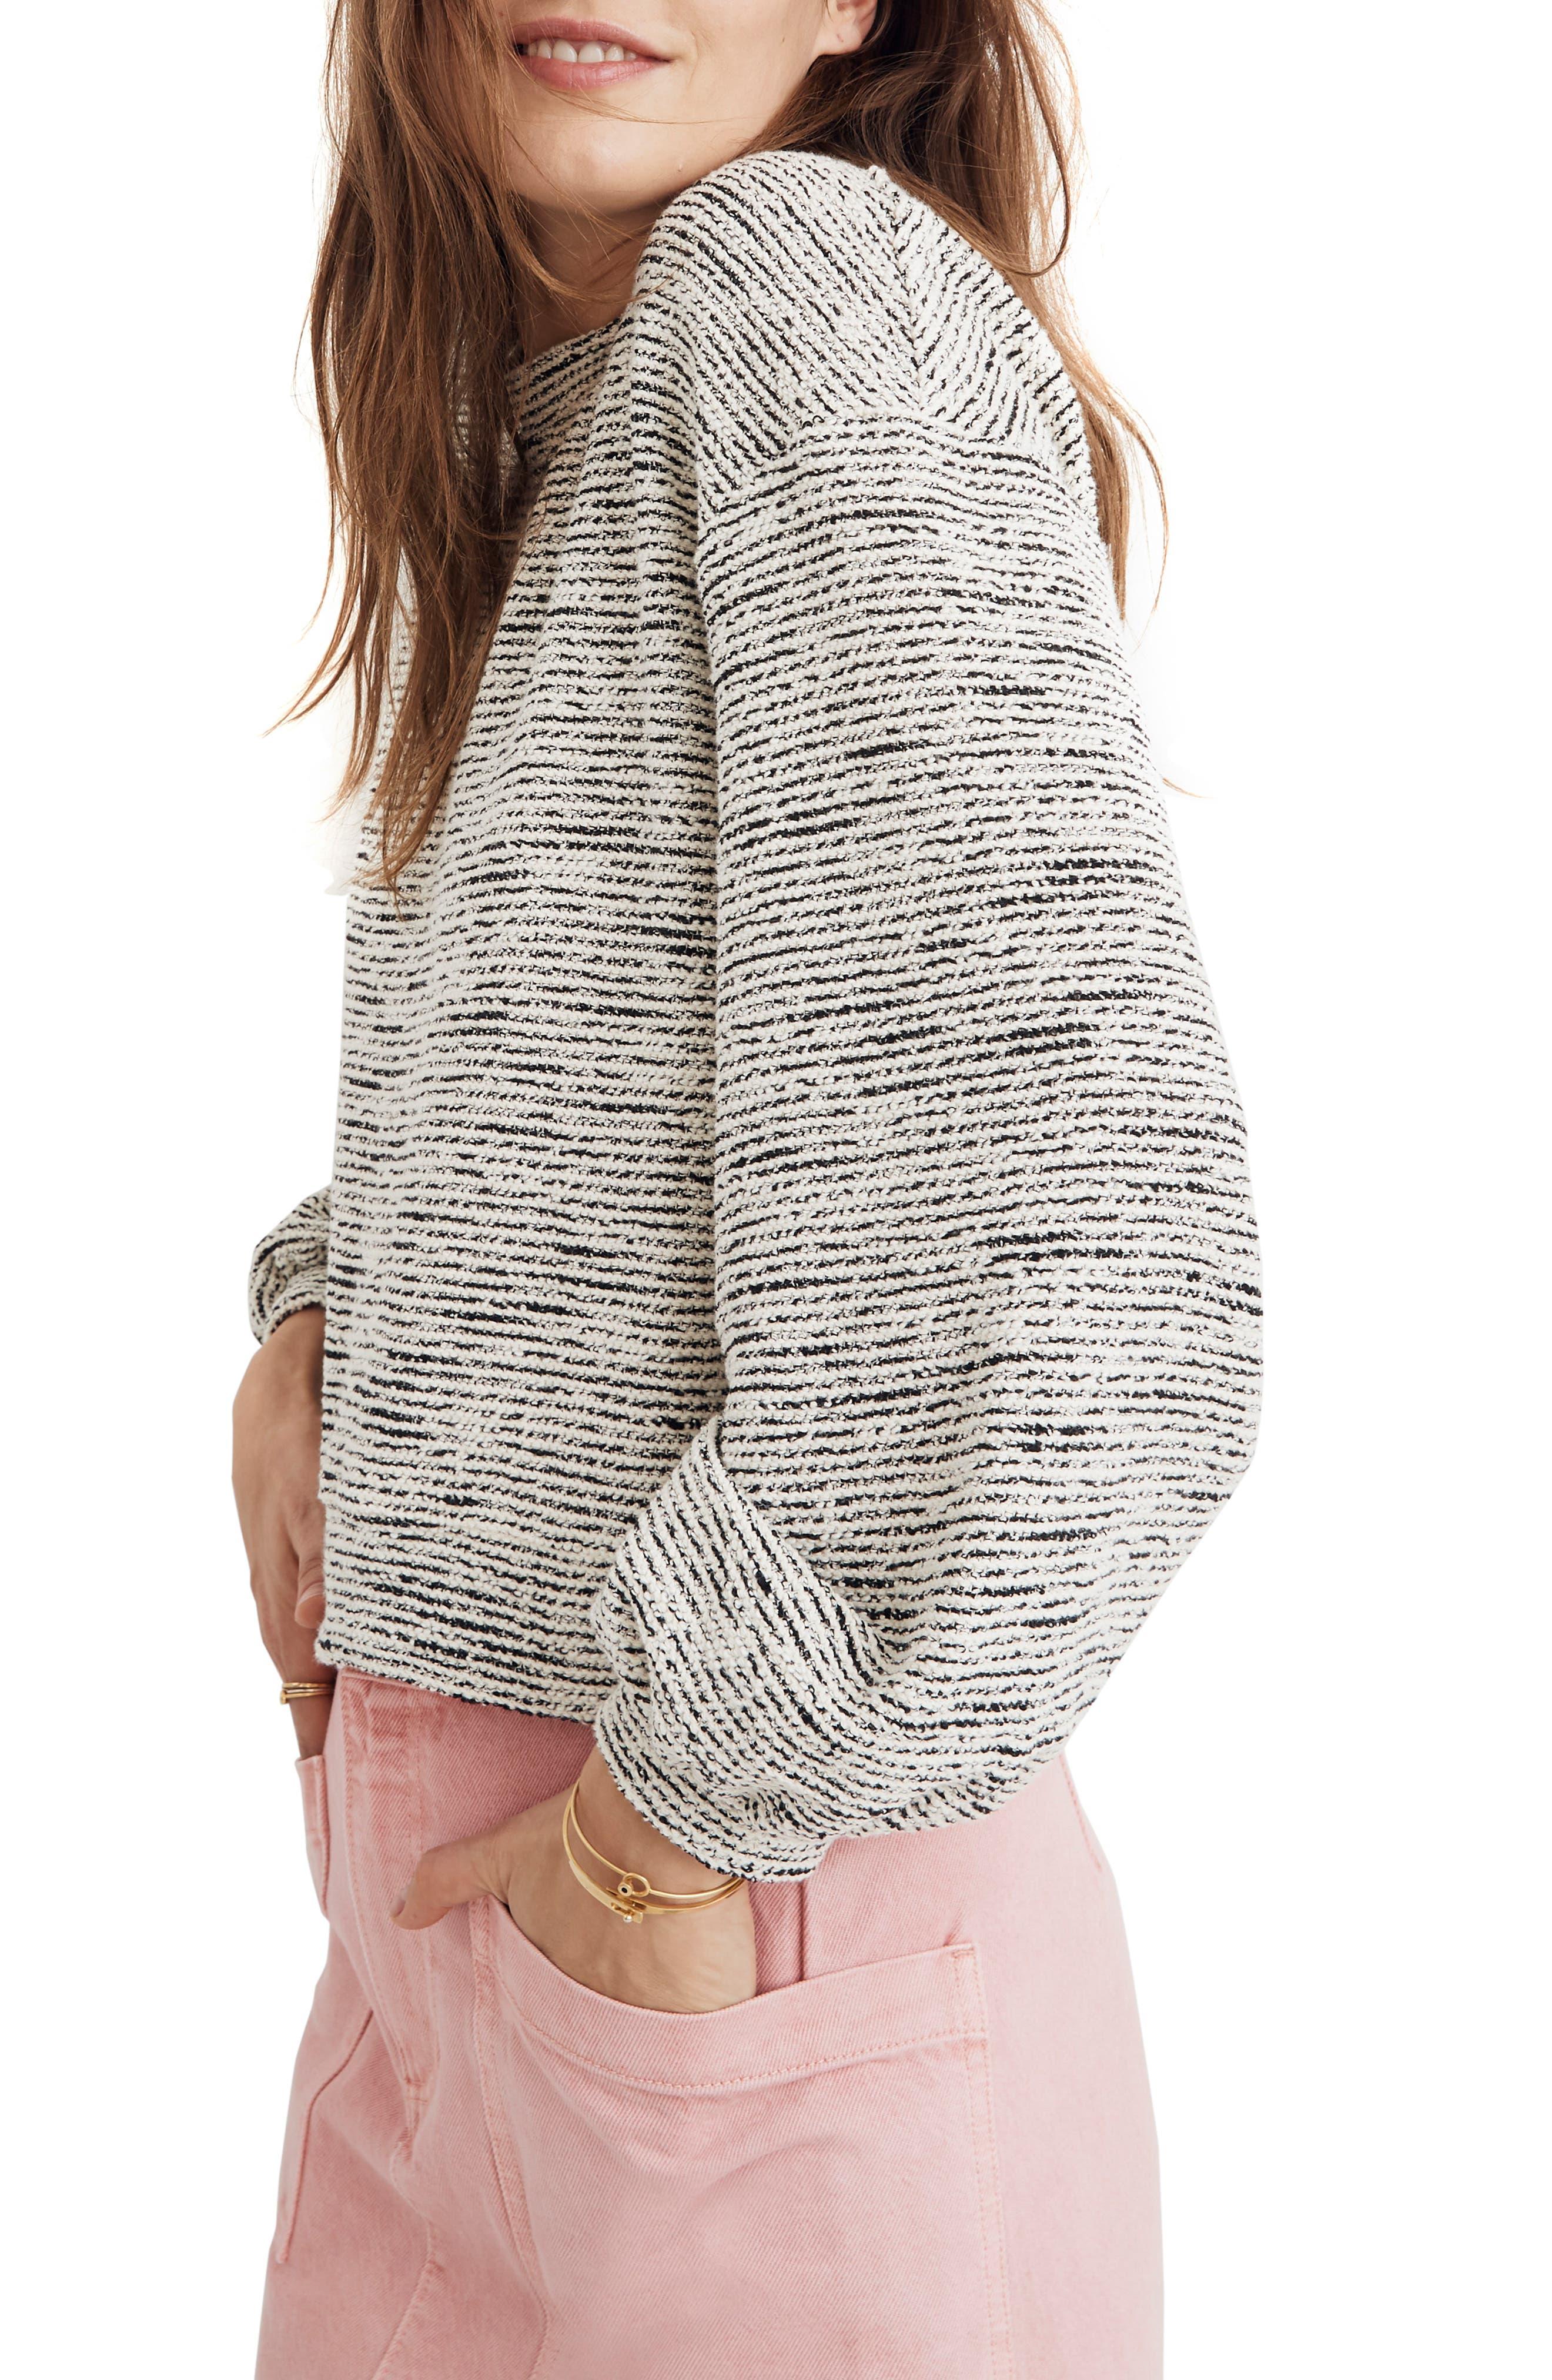 MADEWELL, Texture & Thread Bubble Sleeve Sweatshirt, Alternate thumbnail 3, color, HEATHER GREY